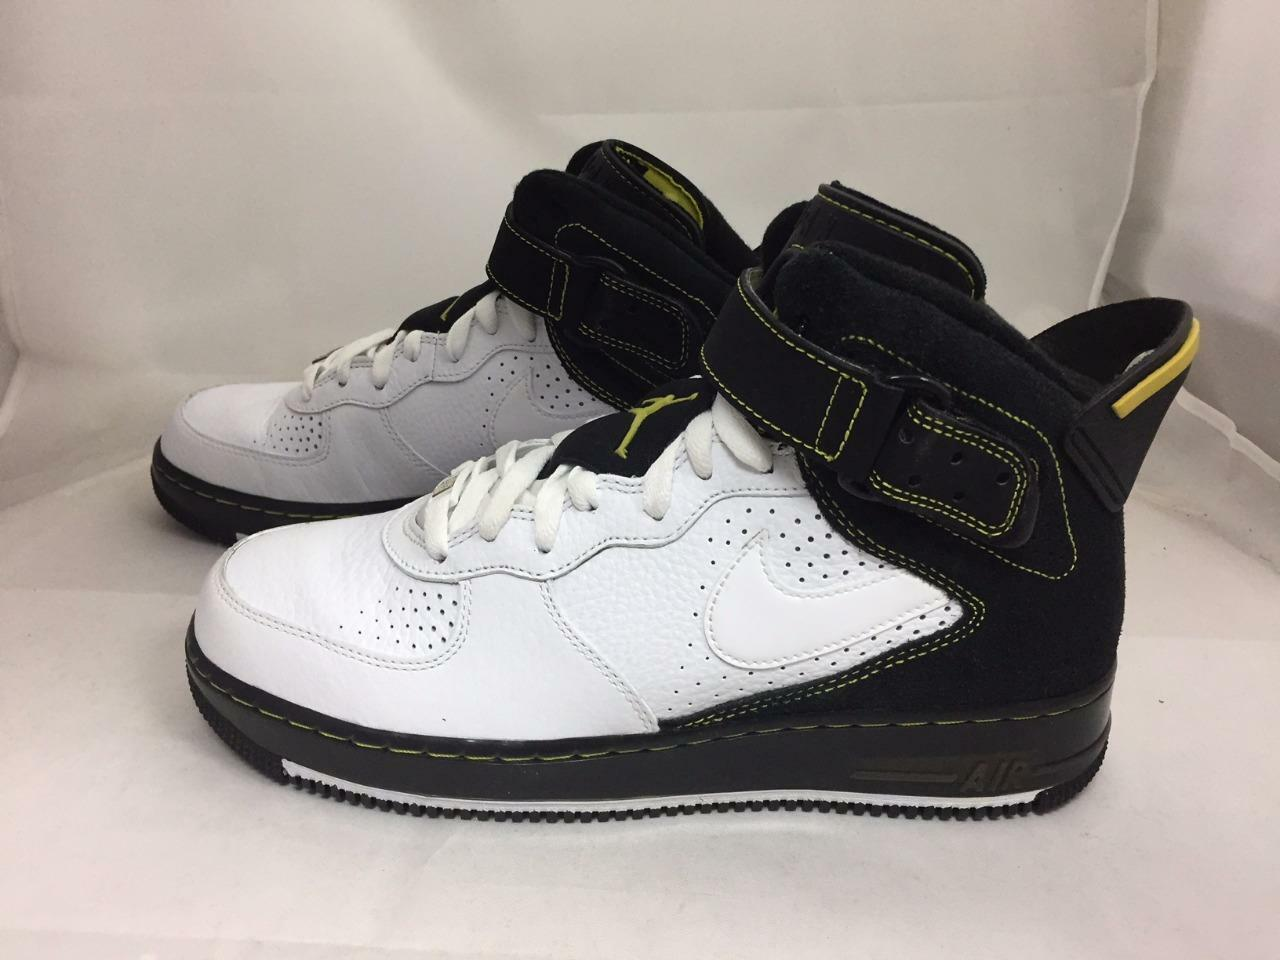 NEW MEN'S NIKE JORDAN AJF6 343064-103 The most popular shoes for men and women